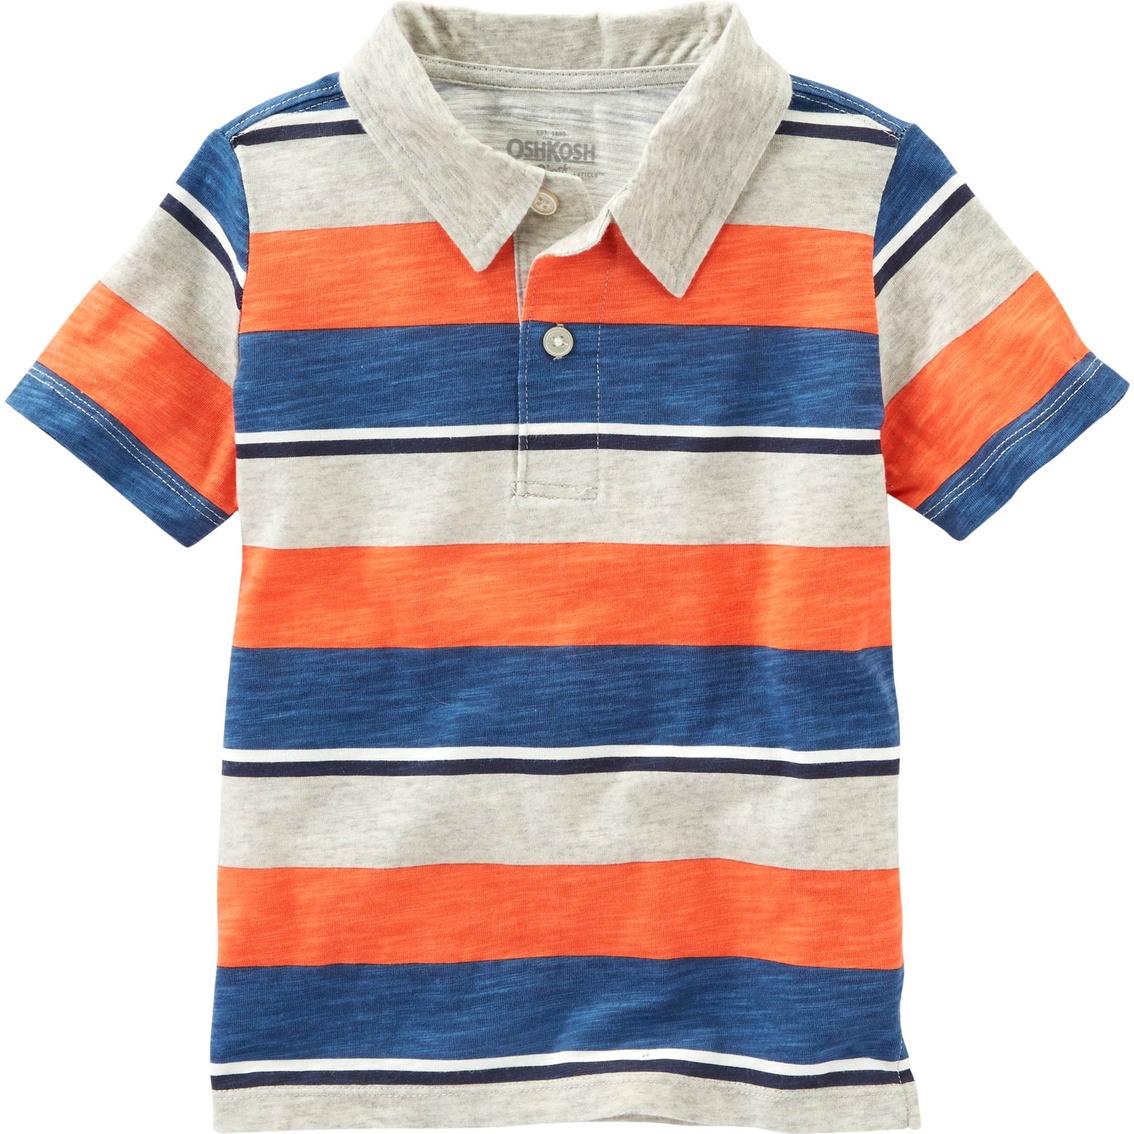 Oshkosh B\'gosh Little Boys Striped Jersey Polo Shirt | Boys 4-7x ...